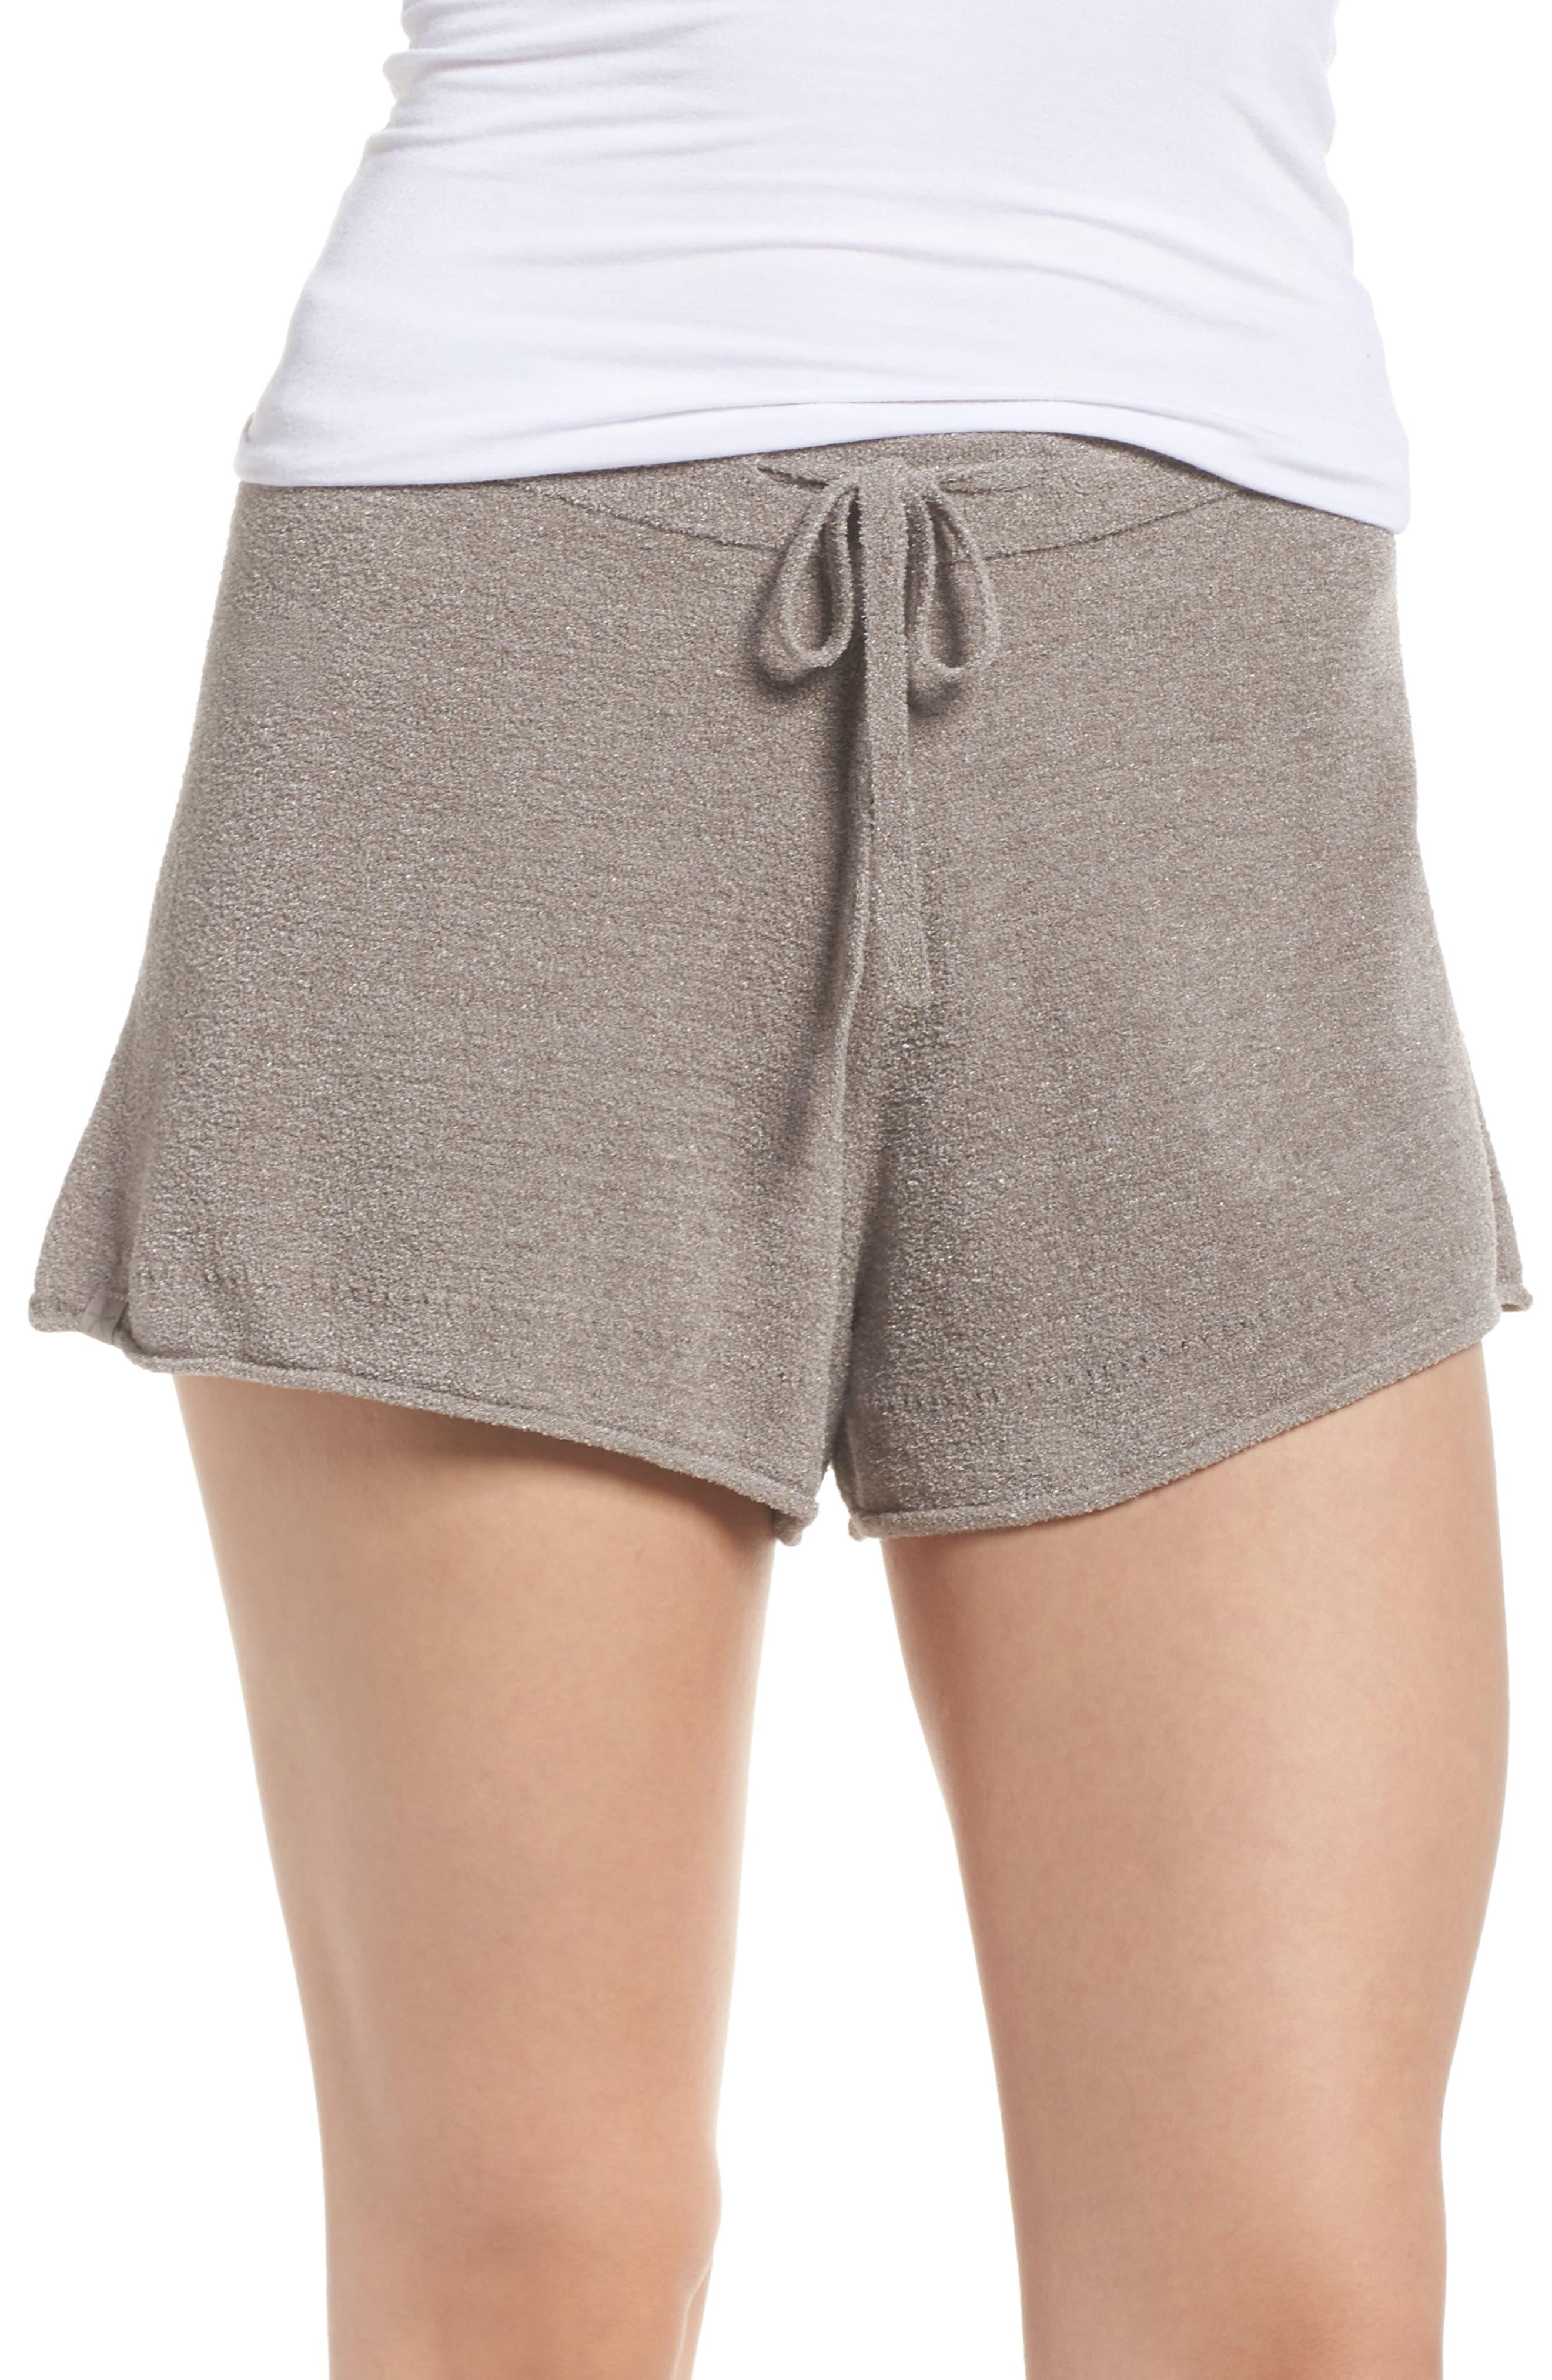 CozyChic Ultra Lite<sup>®</sup> Lounge Shorts,                             Main thumbnail 1, color,                             Beach Rock